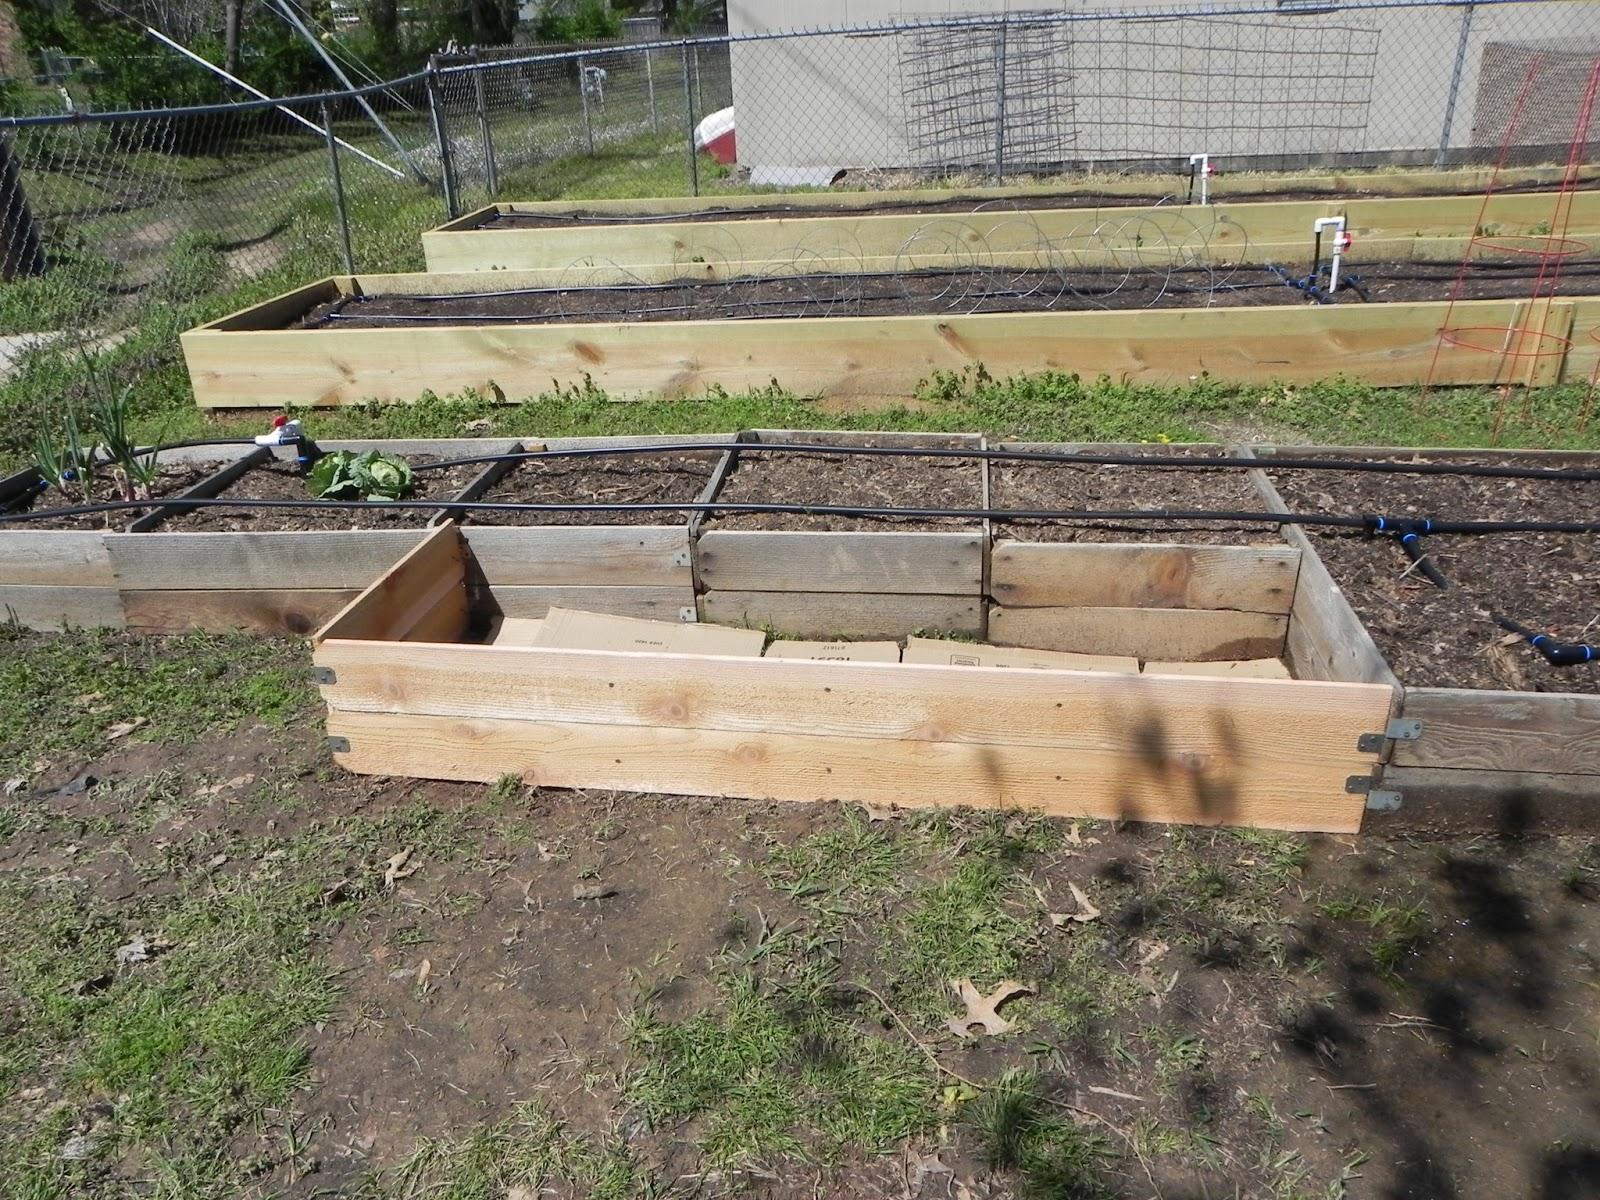 reaganite71 39 s blog cheap easy raised bed garden addition. Black Bedroom Furniture Sets. Home Design Ideas